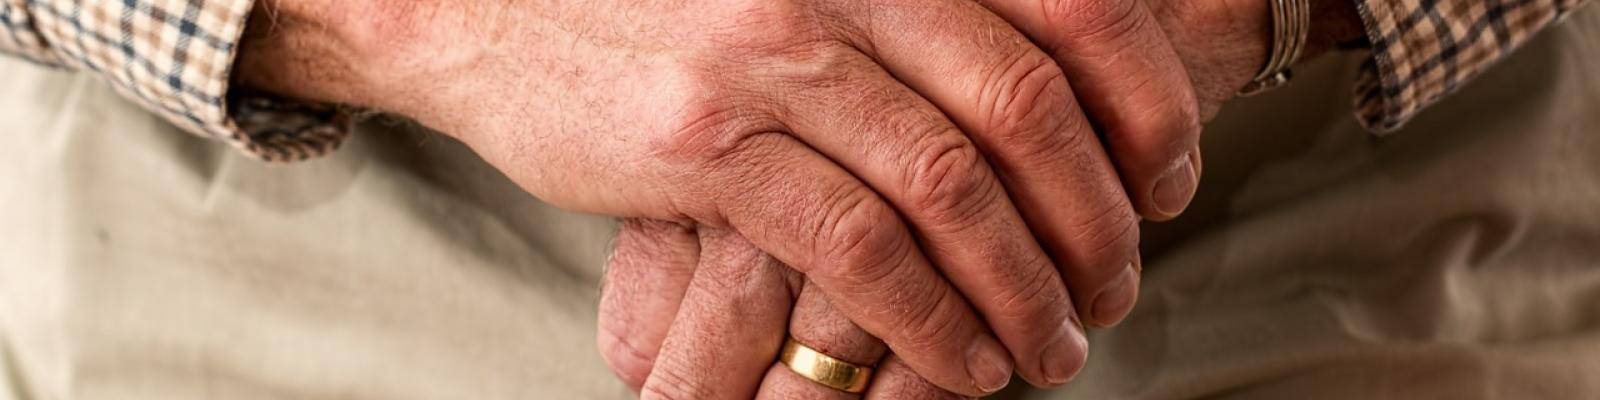 Handen oudere man